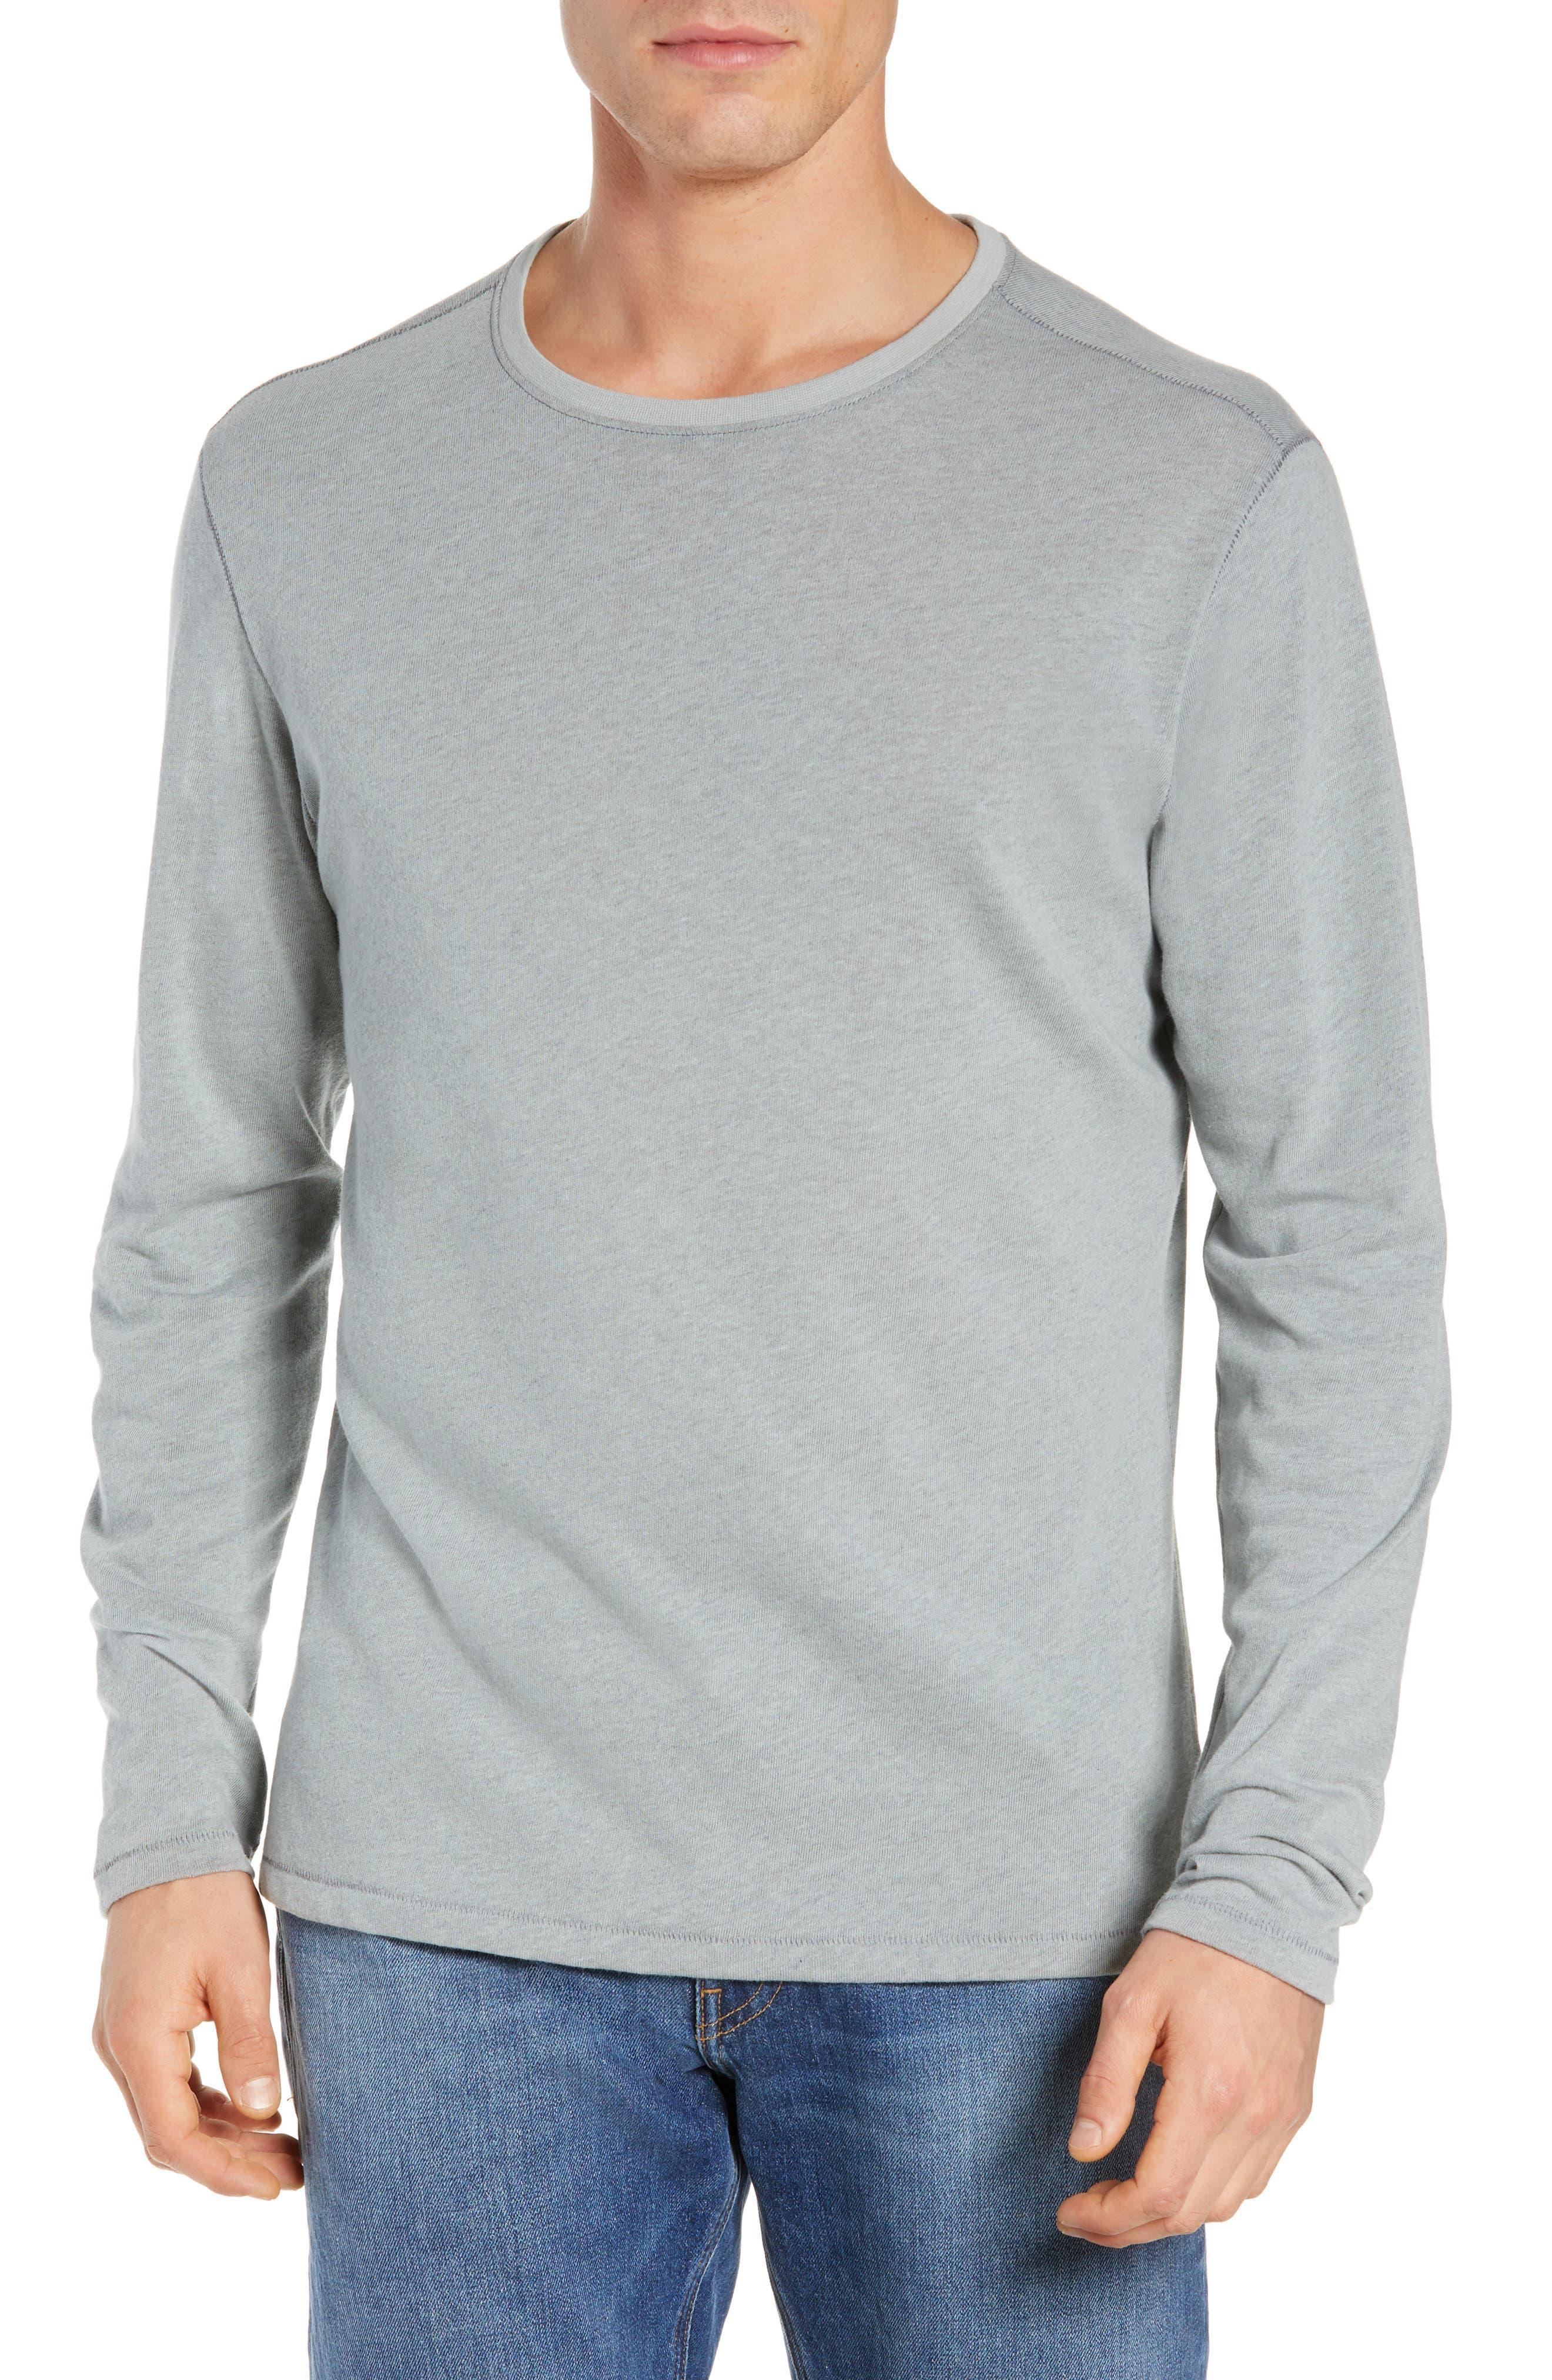 White Rock T-Shirt,                             Main thumbnail 1, color,                             LIGHT GREY